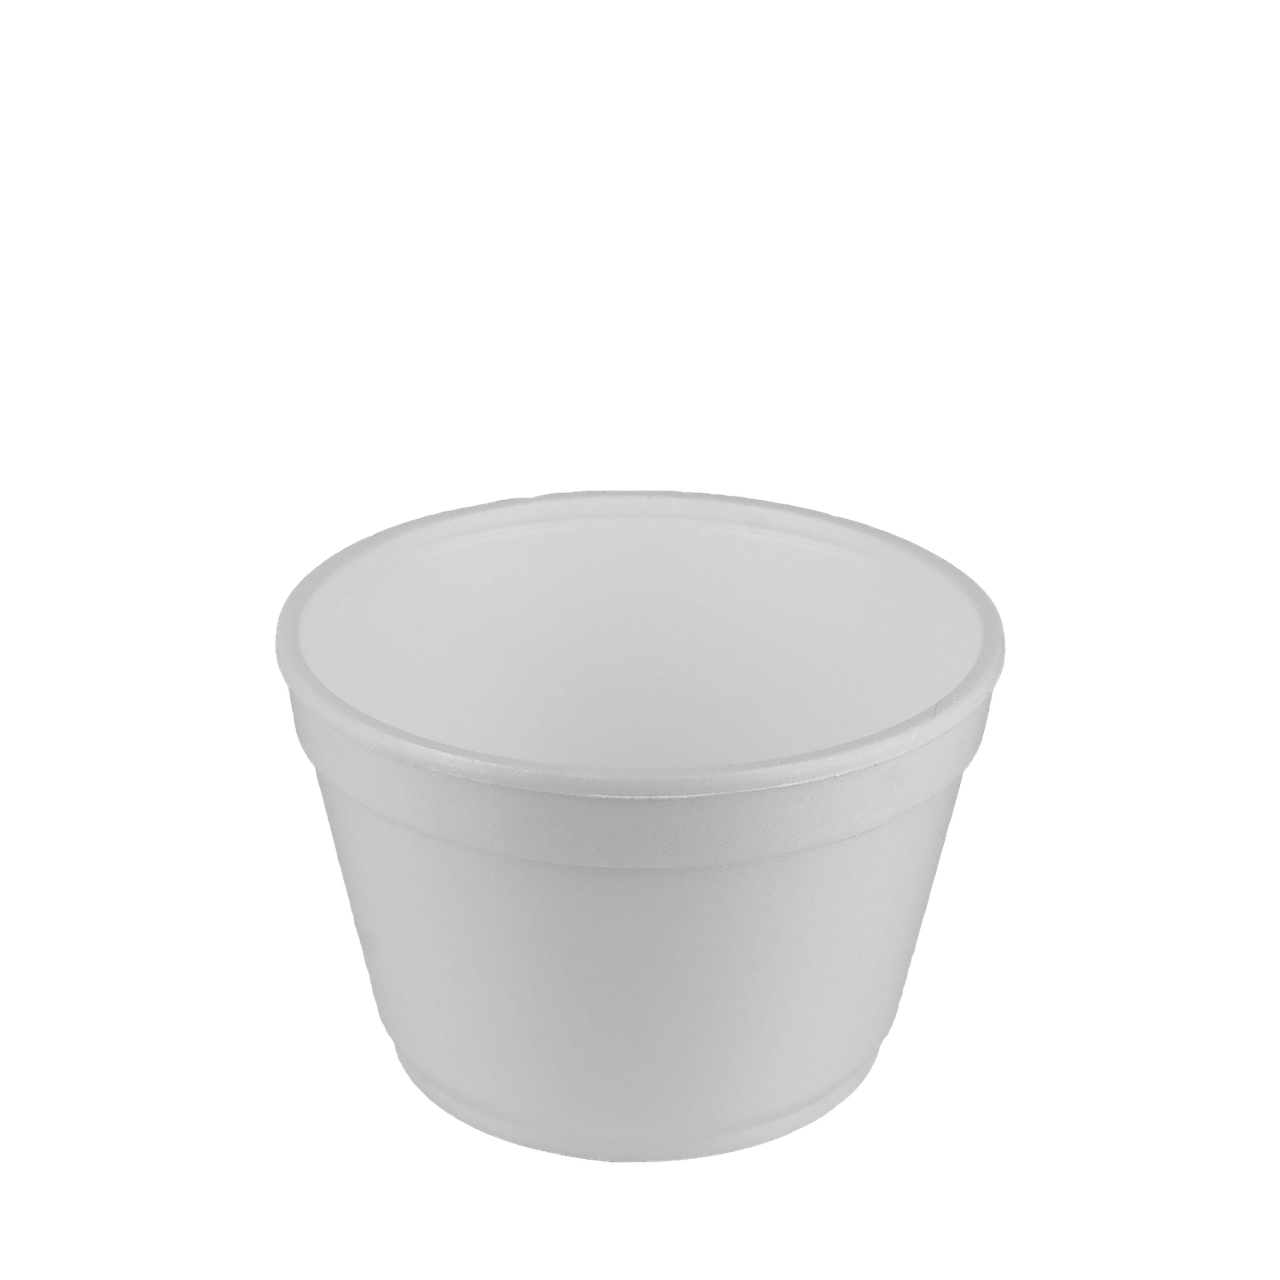 Супница Пенополистирол 500мл (1уп/25шт)